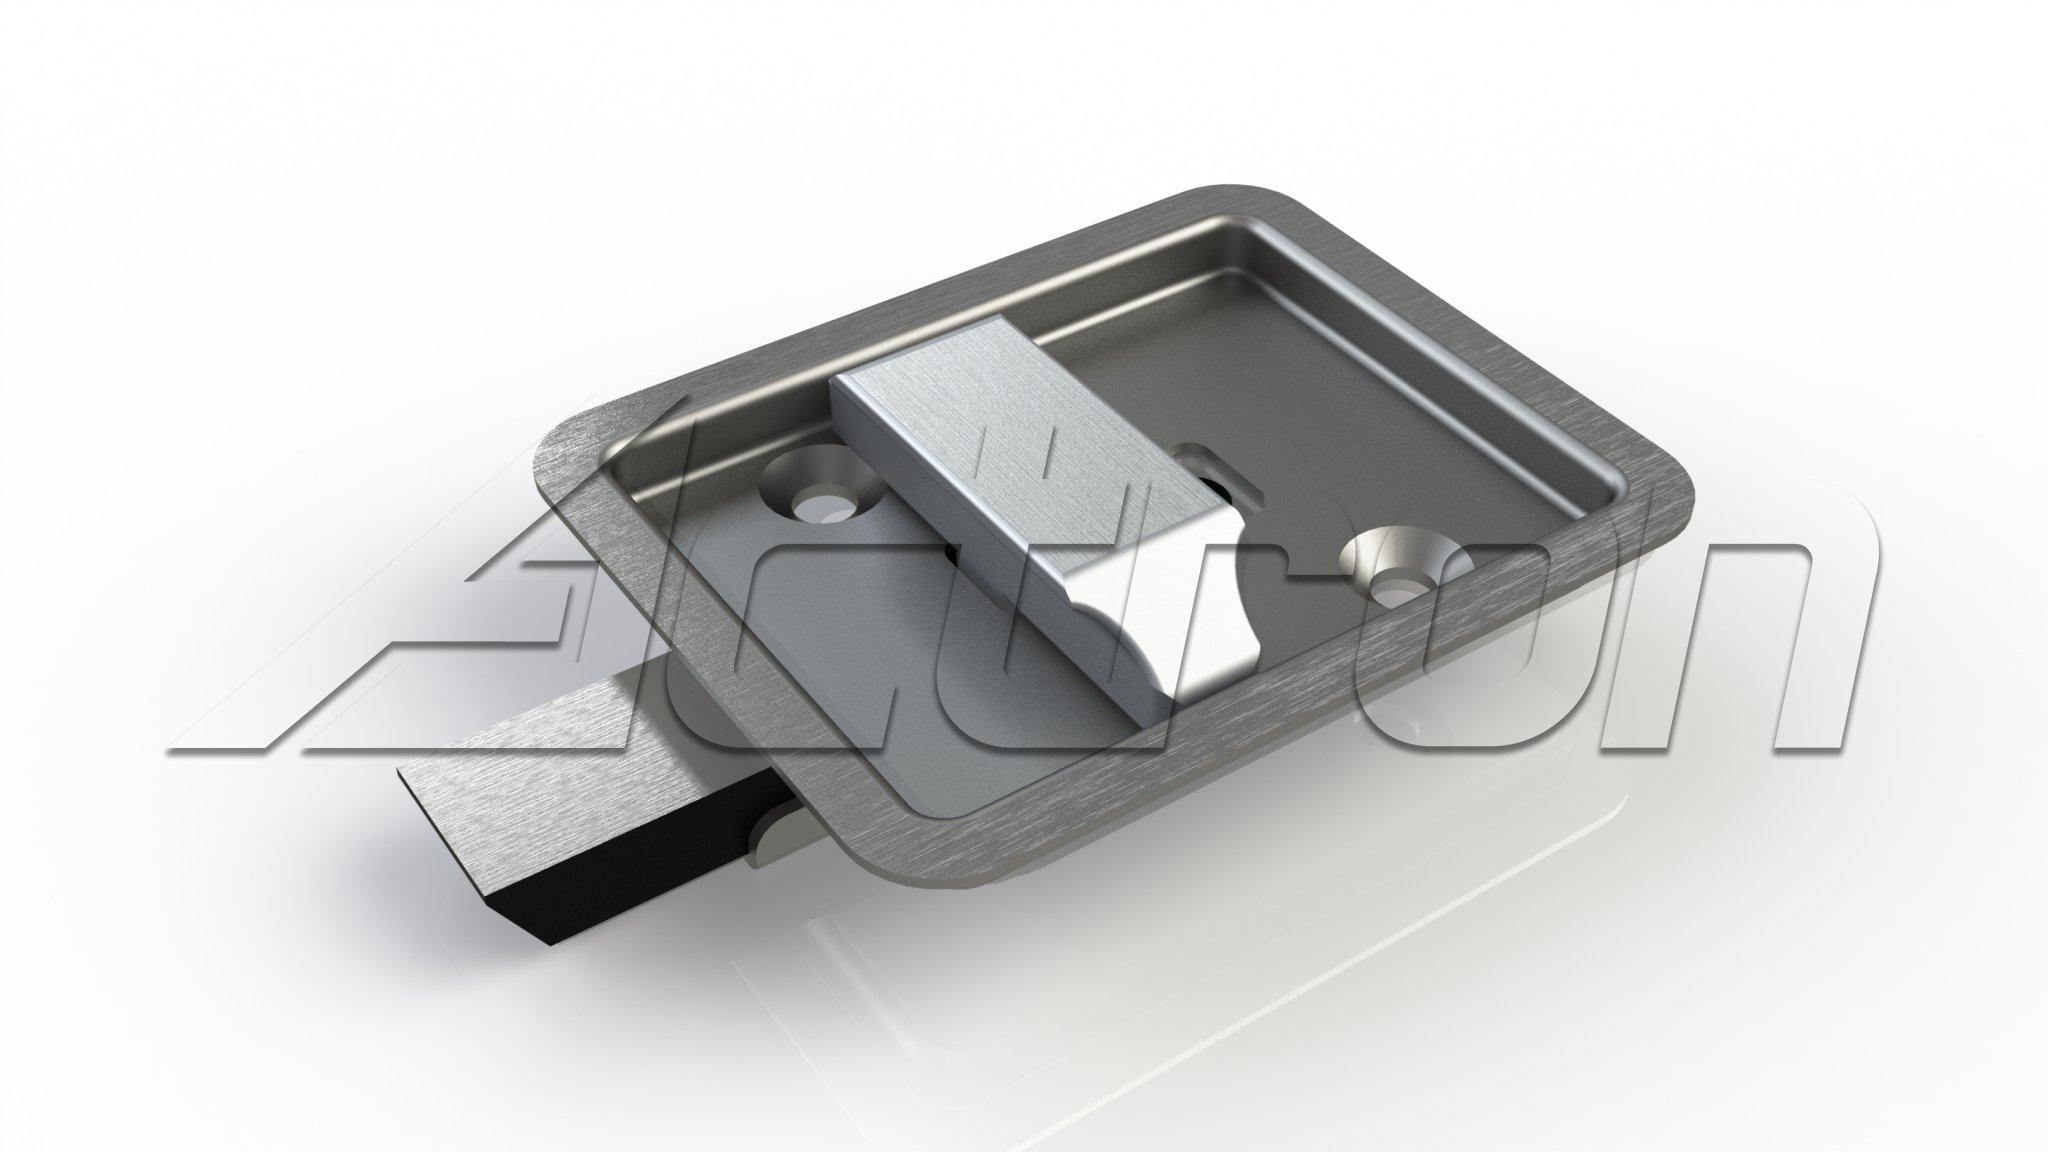 latch-assy-8211-sliding-4518-a27036.jpg